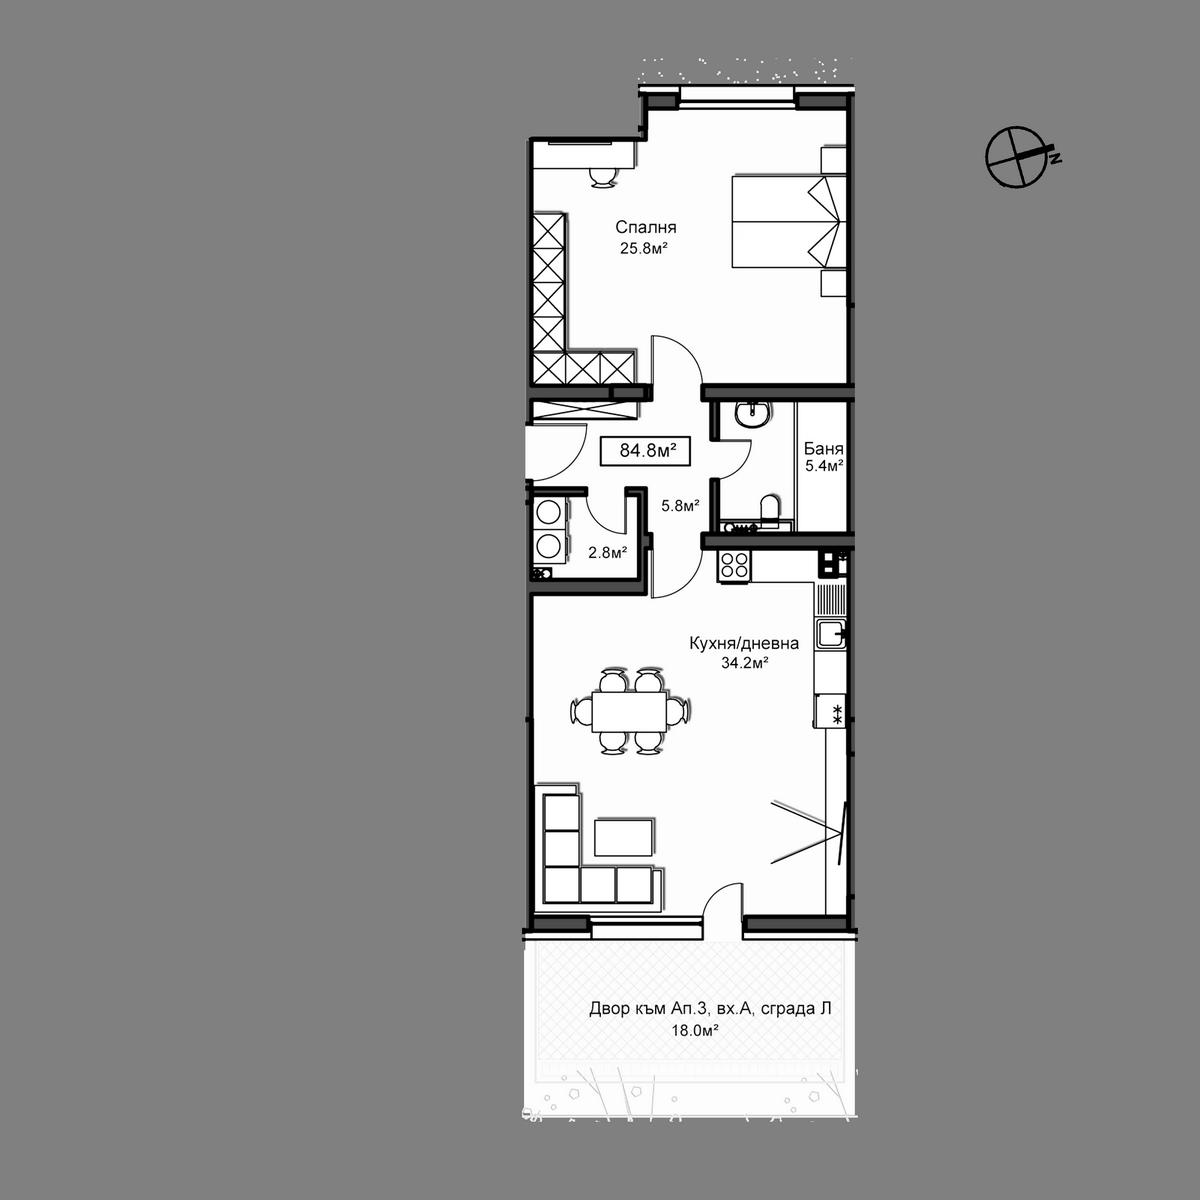 Продава апартамент ново строителство - Апартамент А3